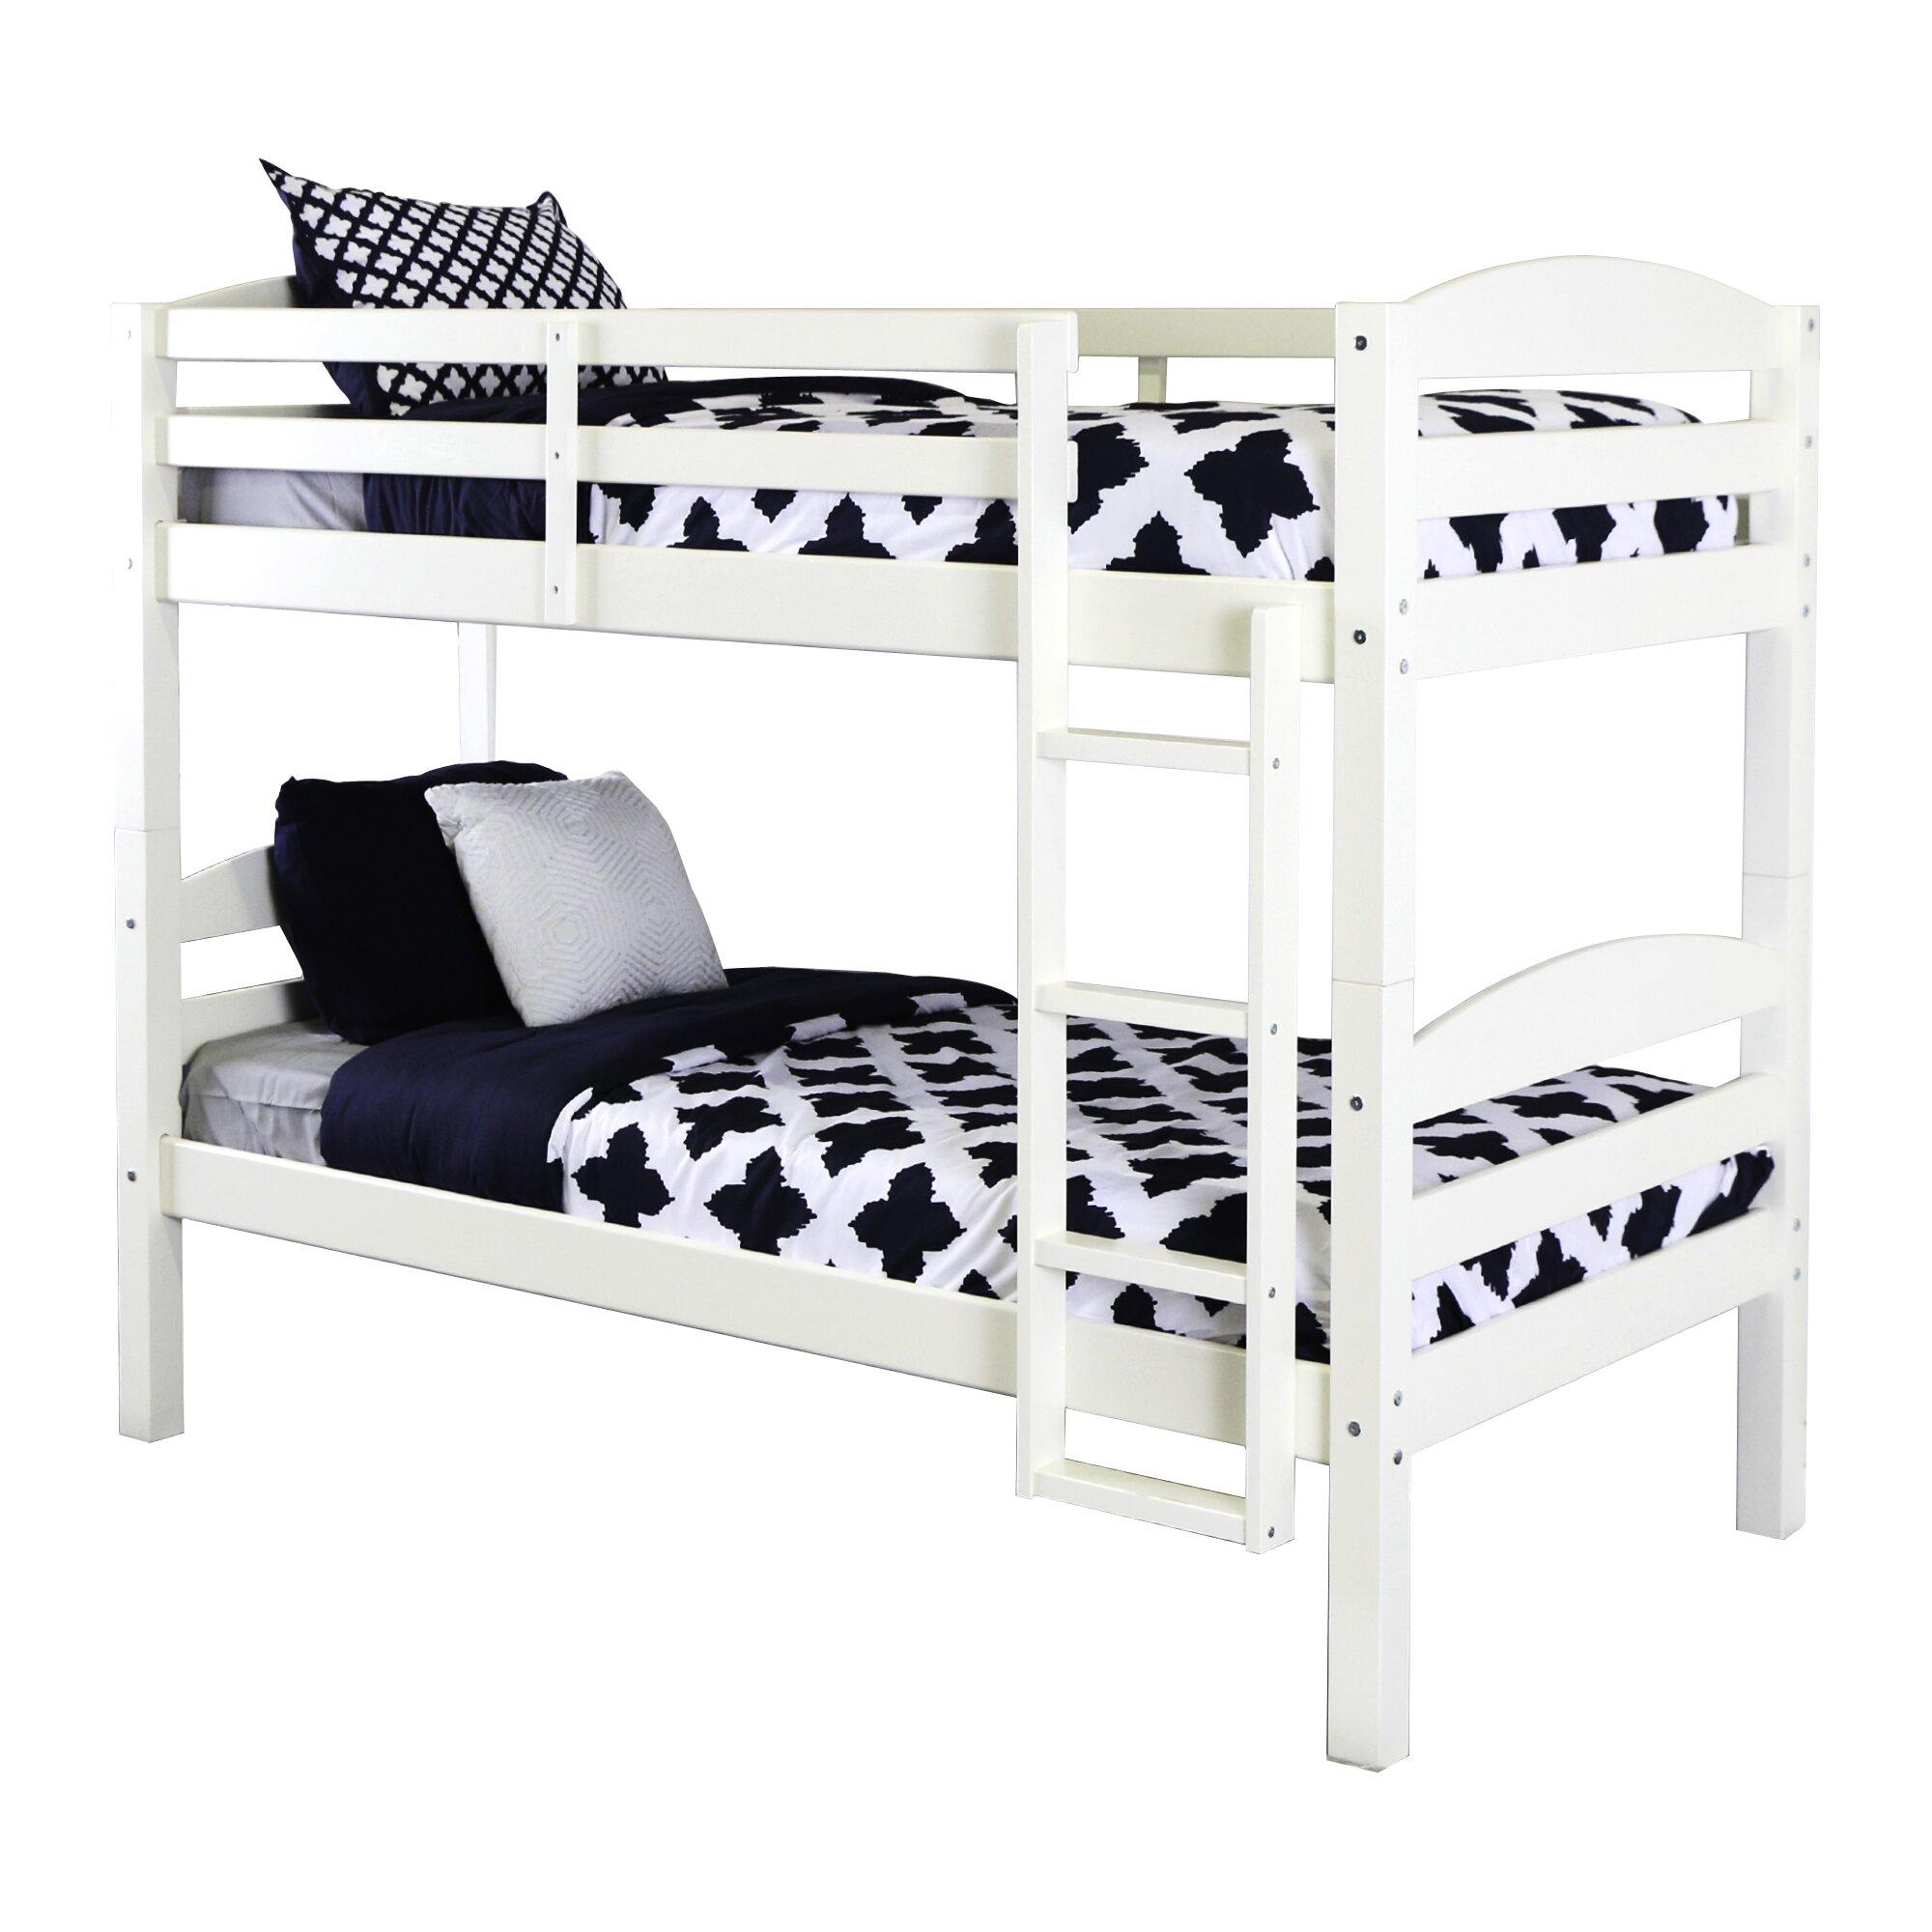 Home loft concepts twin bunk bed reviews wayfair for Home loft concept bunk bed